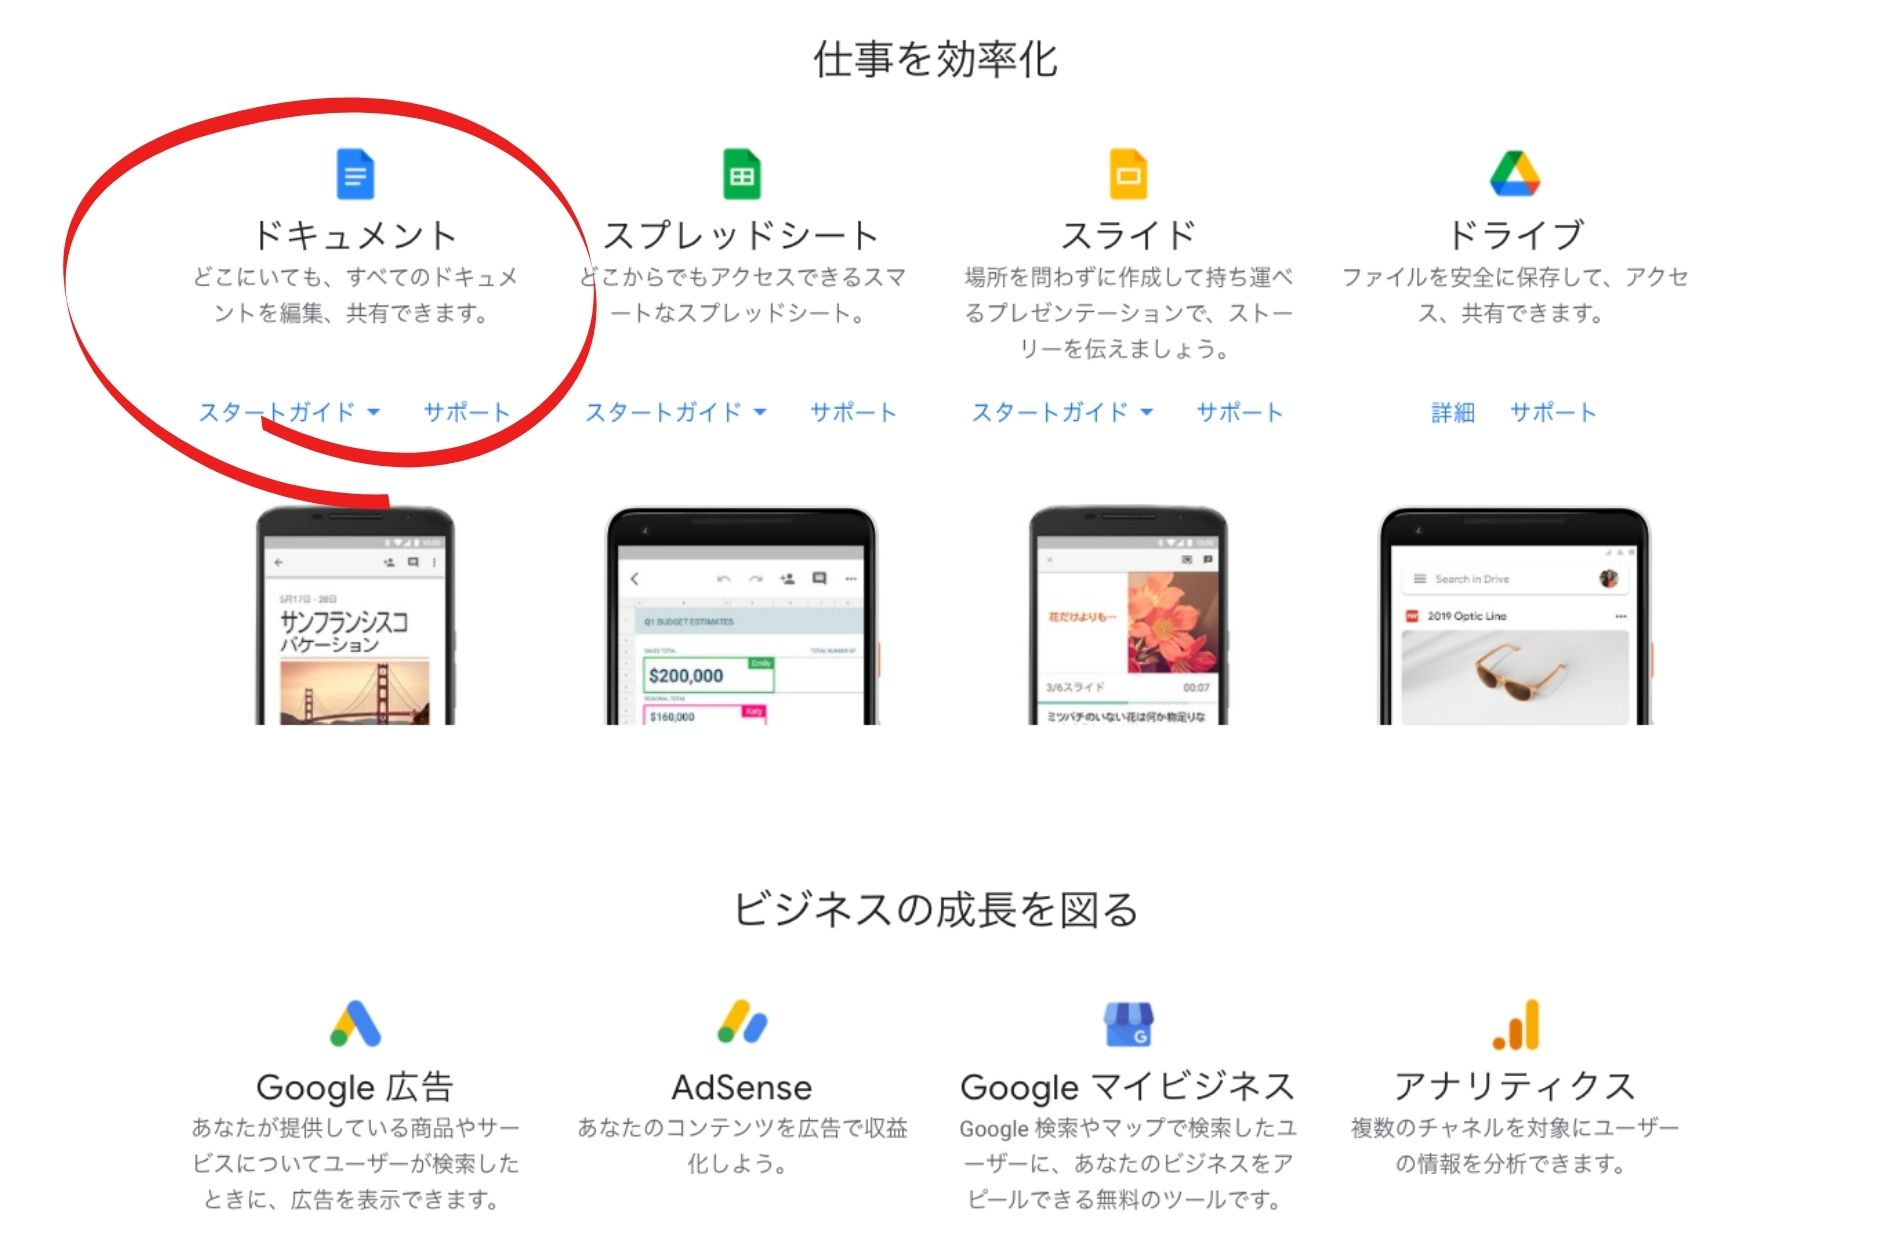 Google無料アプリケーションの紹介